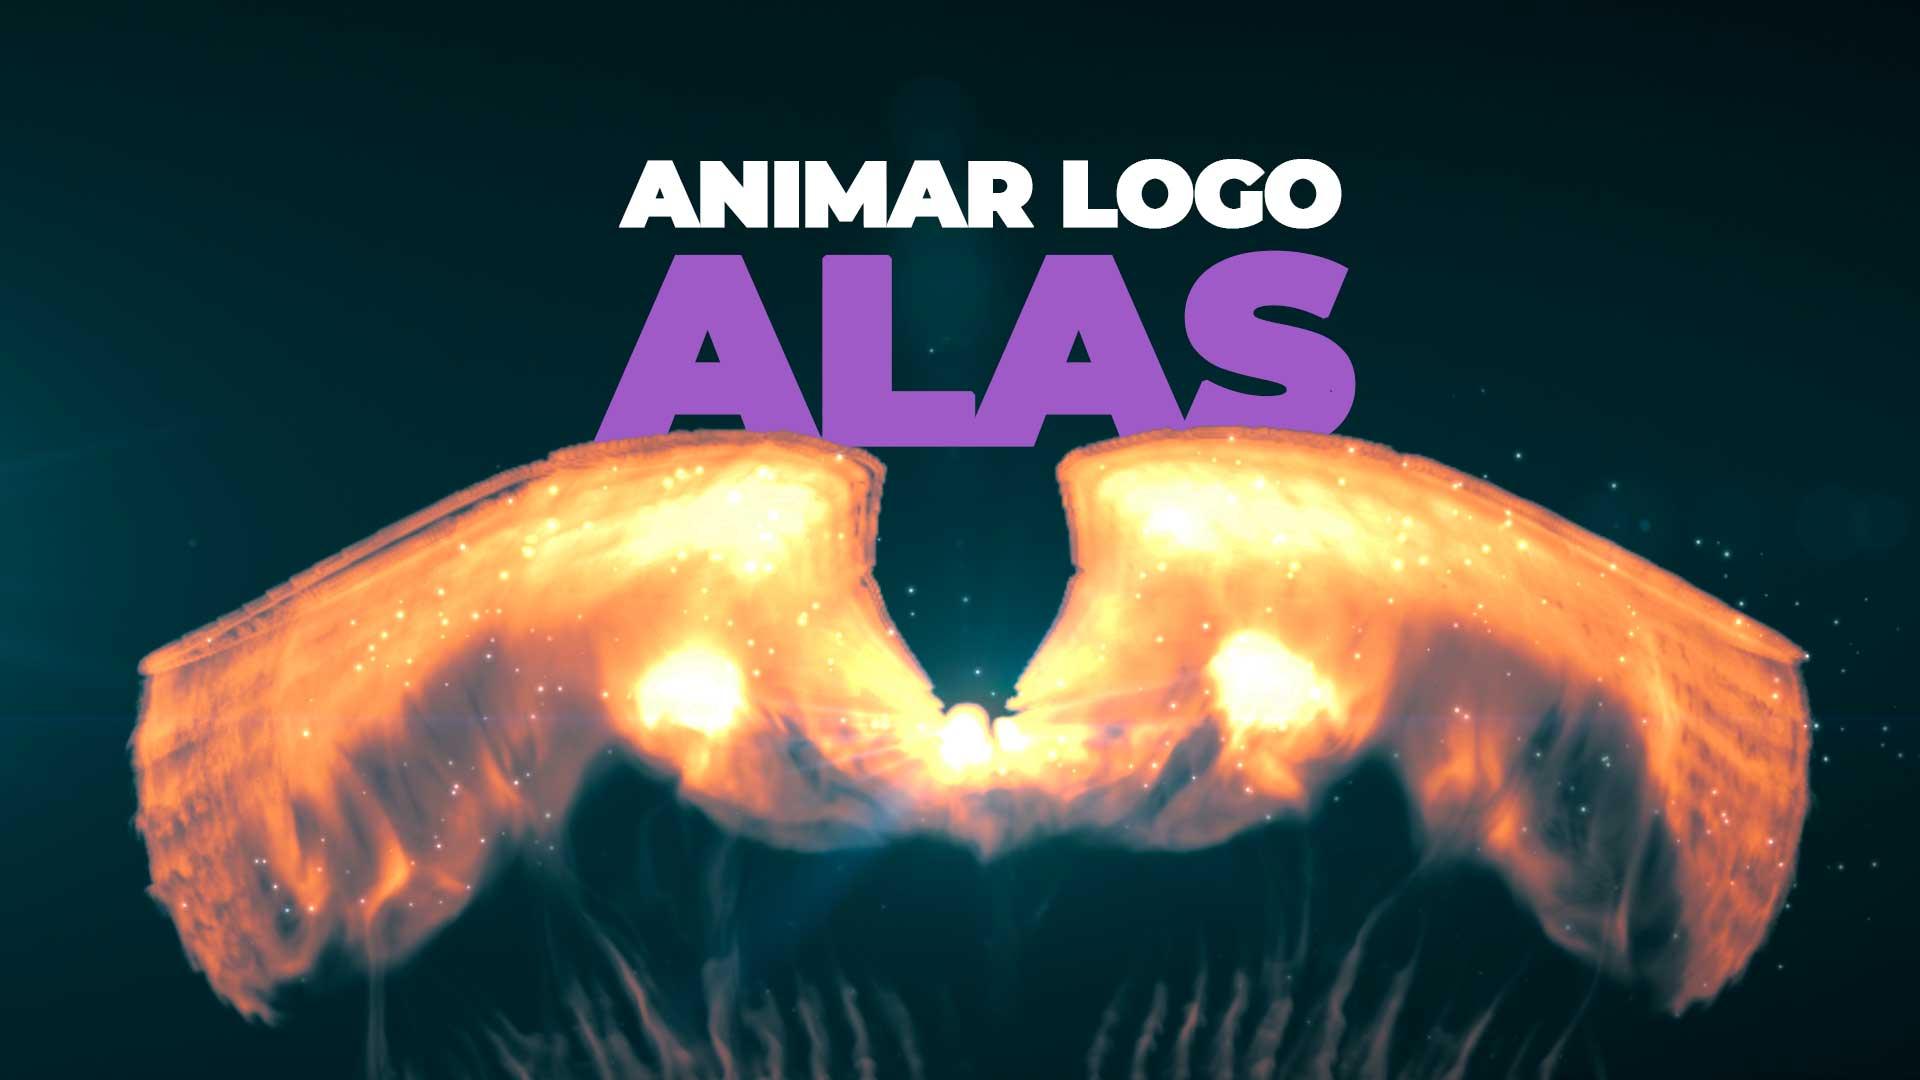 Animar-logo-ALAS-blog-animarlogo